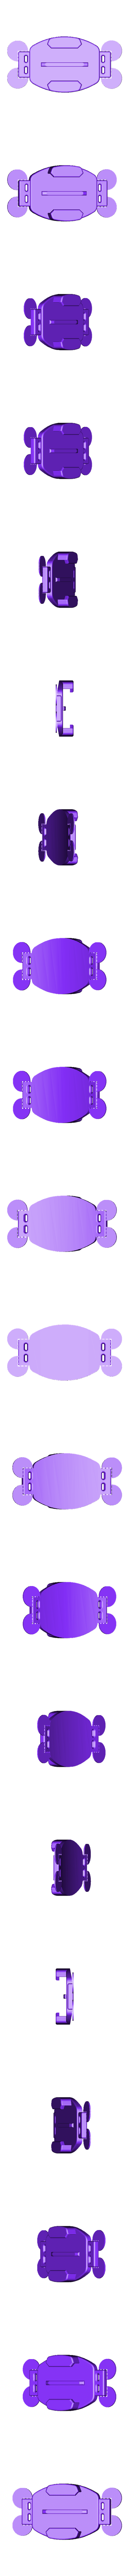 CurvedMount_ziptie.stl Download free STL file Zip tie GoPro Curved Mount • 3D printing template, Cerragh